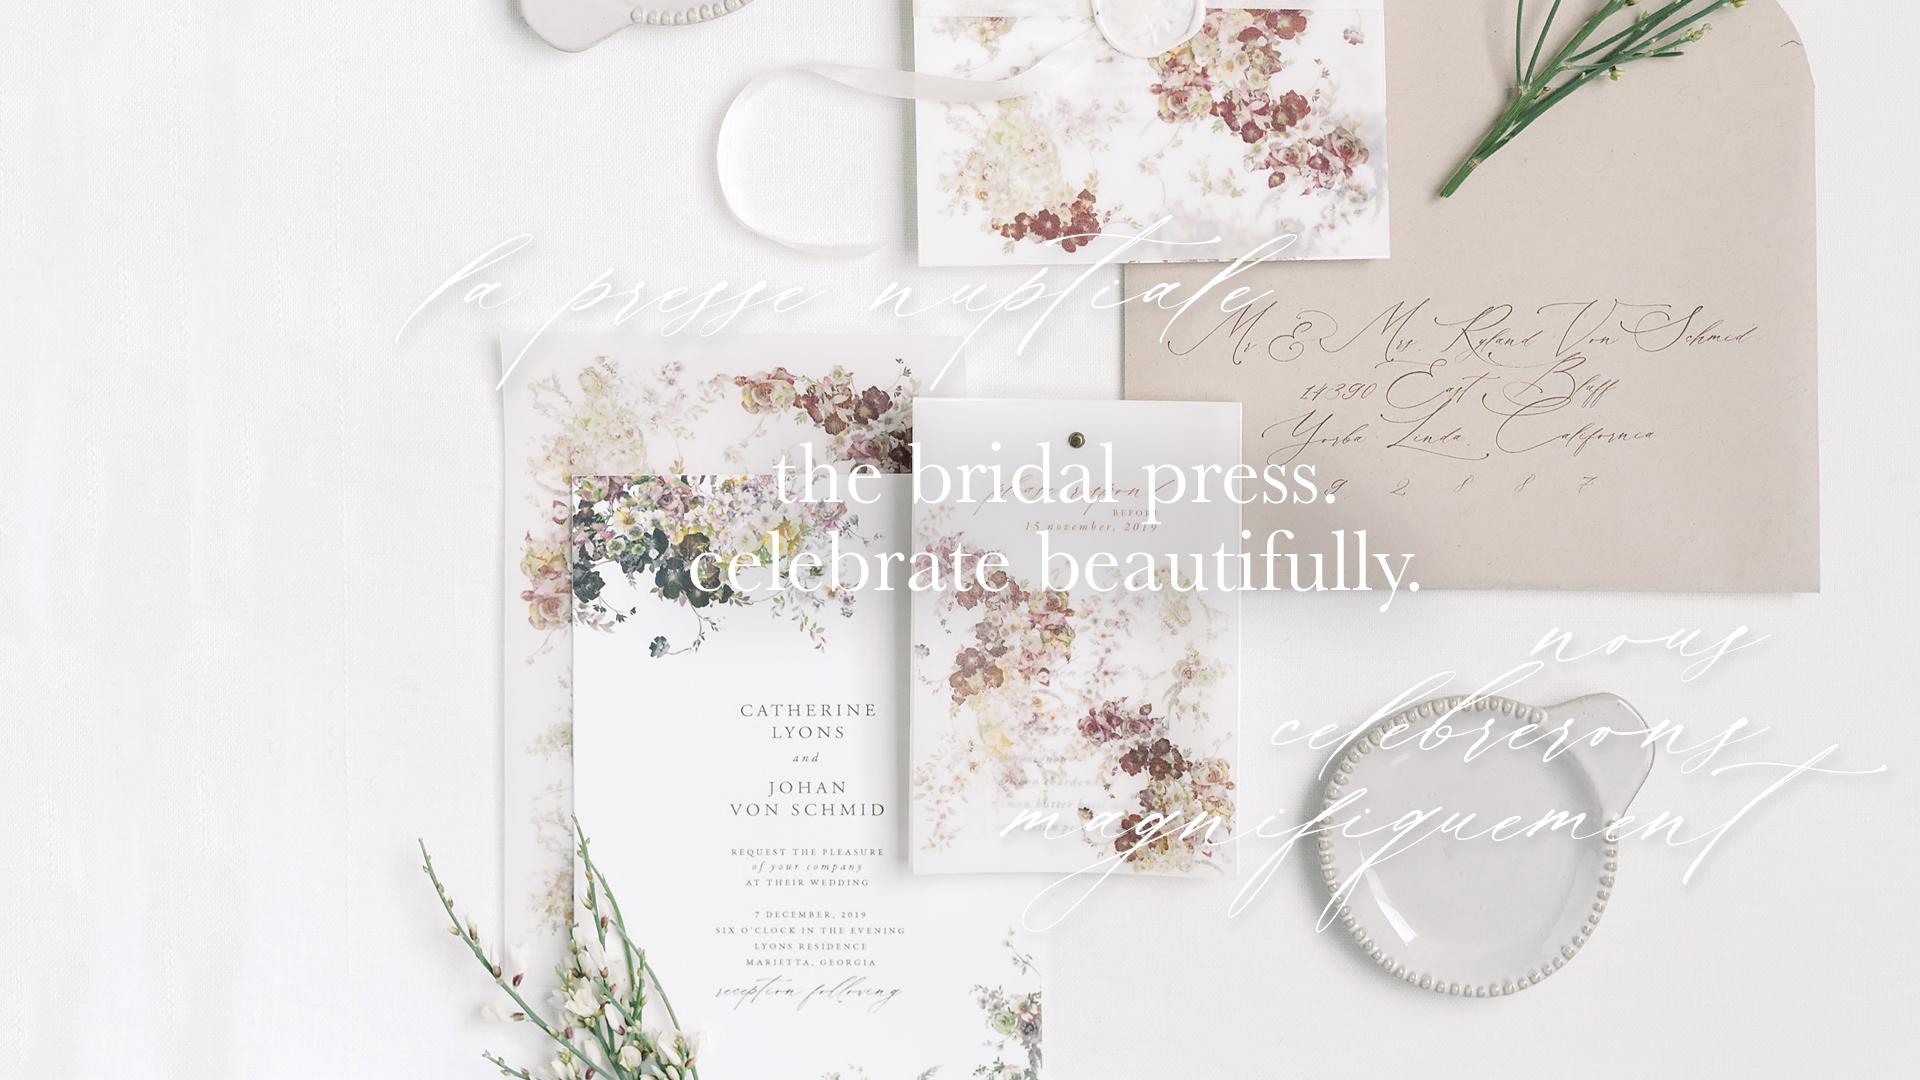 The Bridal Press Wedding Invitations